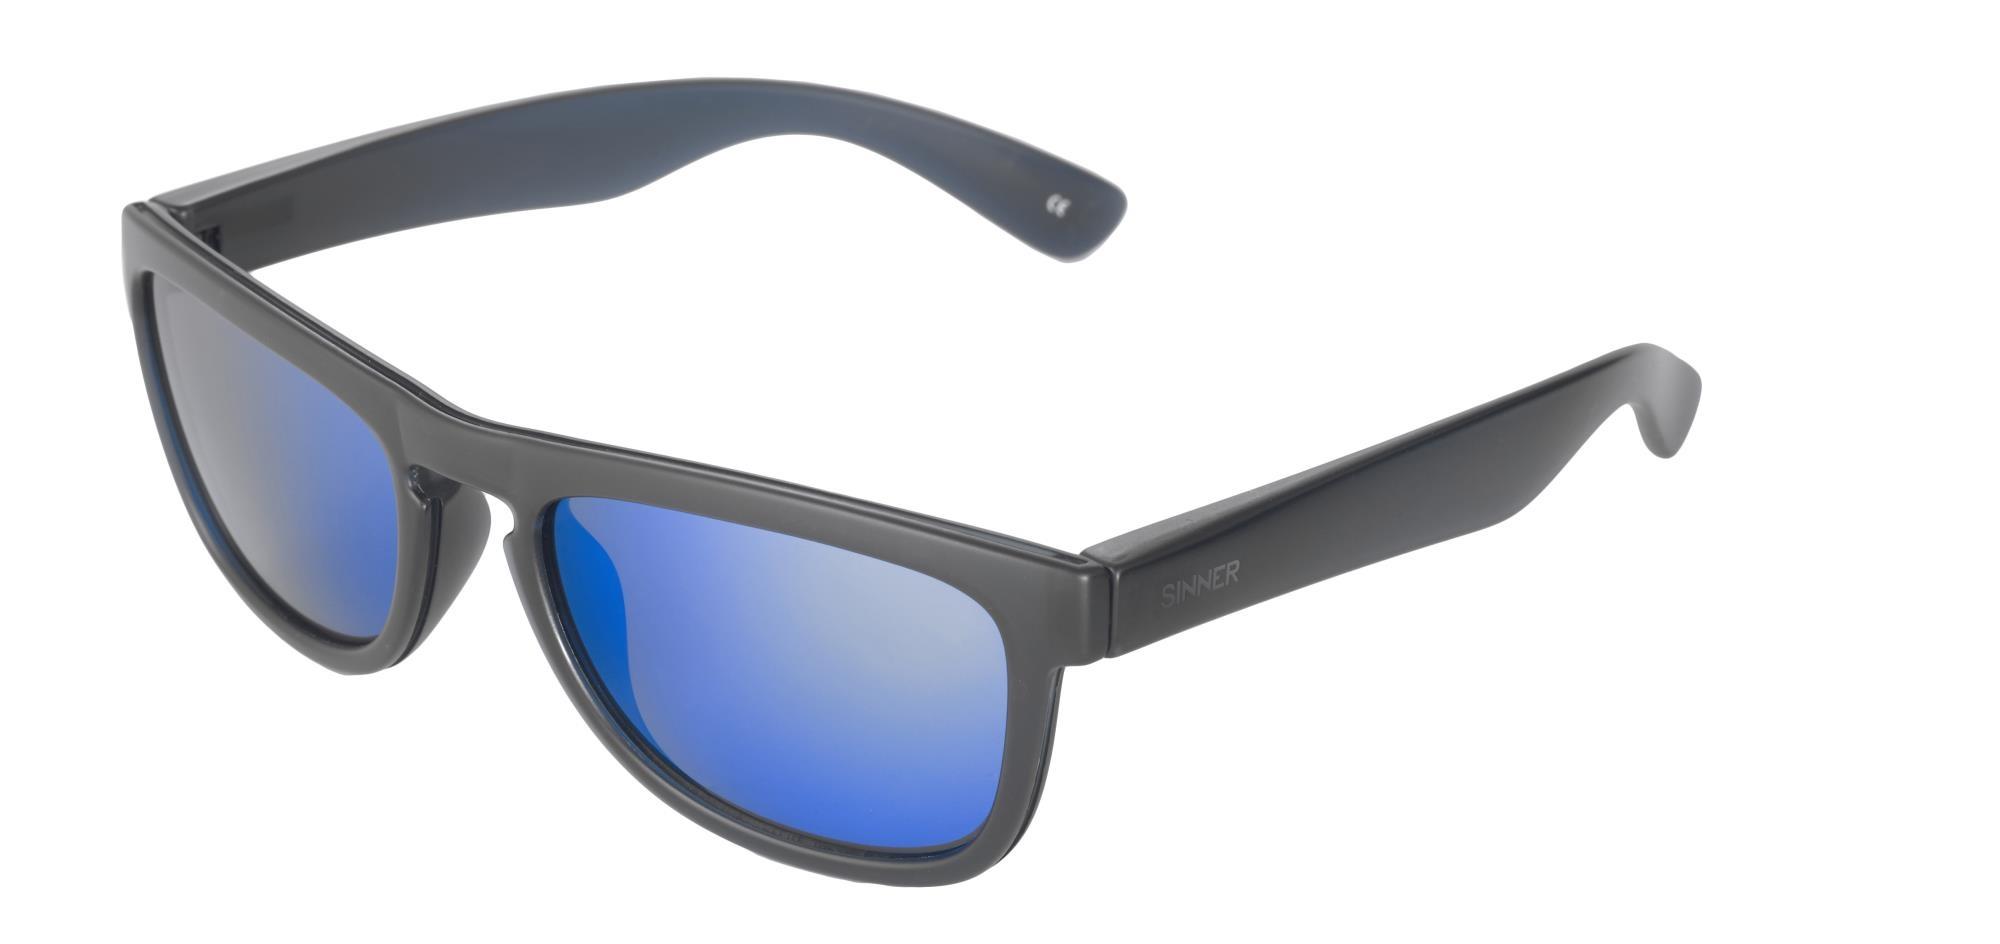 8d6e946733e3 Sinner sunglasses Richmond Cry matt black - Internet-Toys